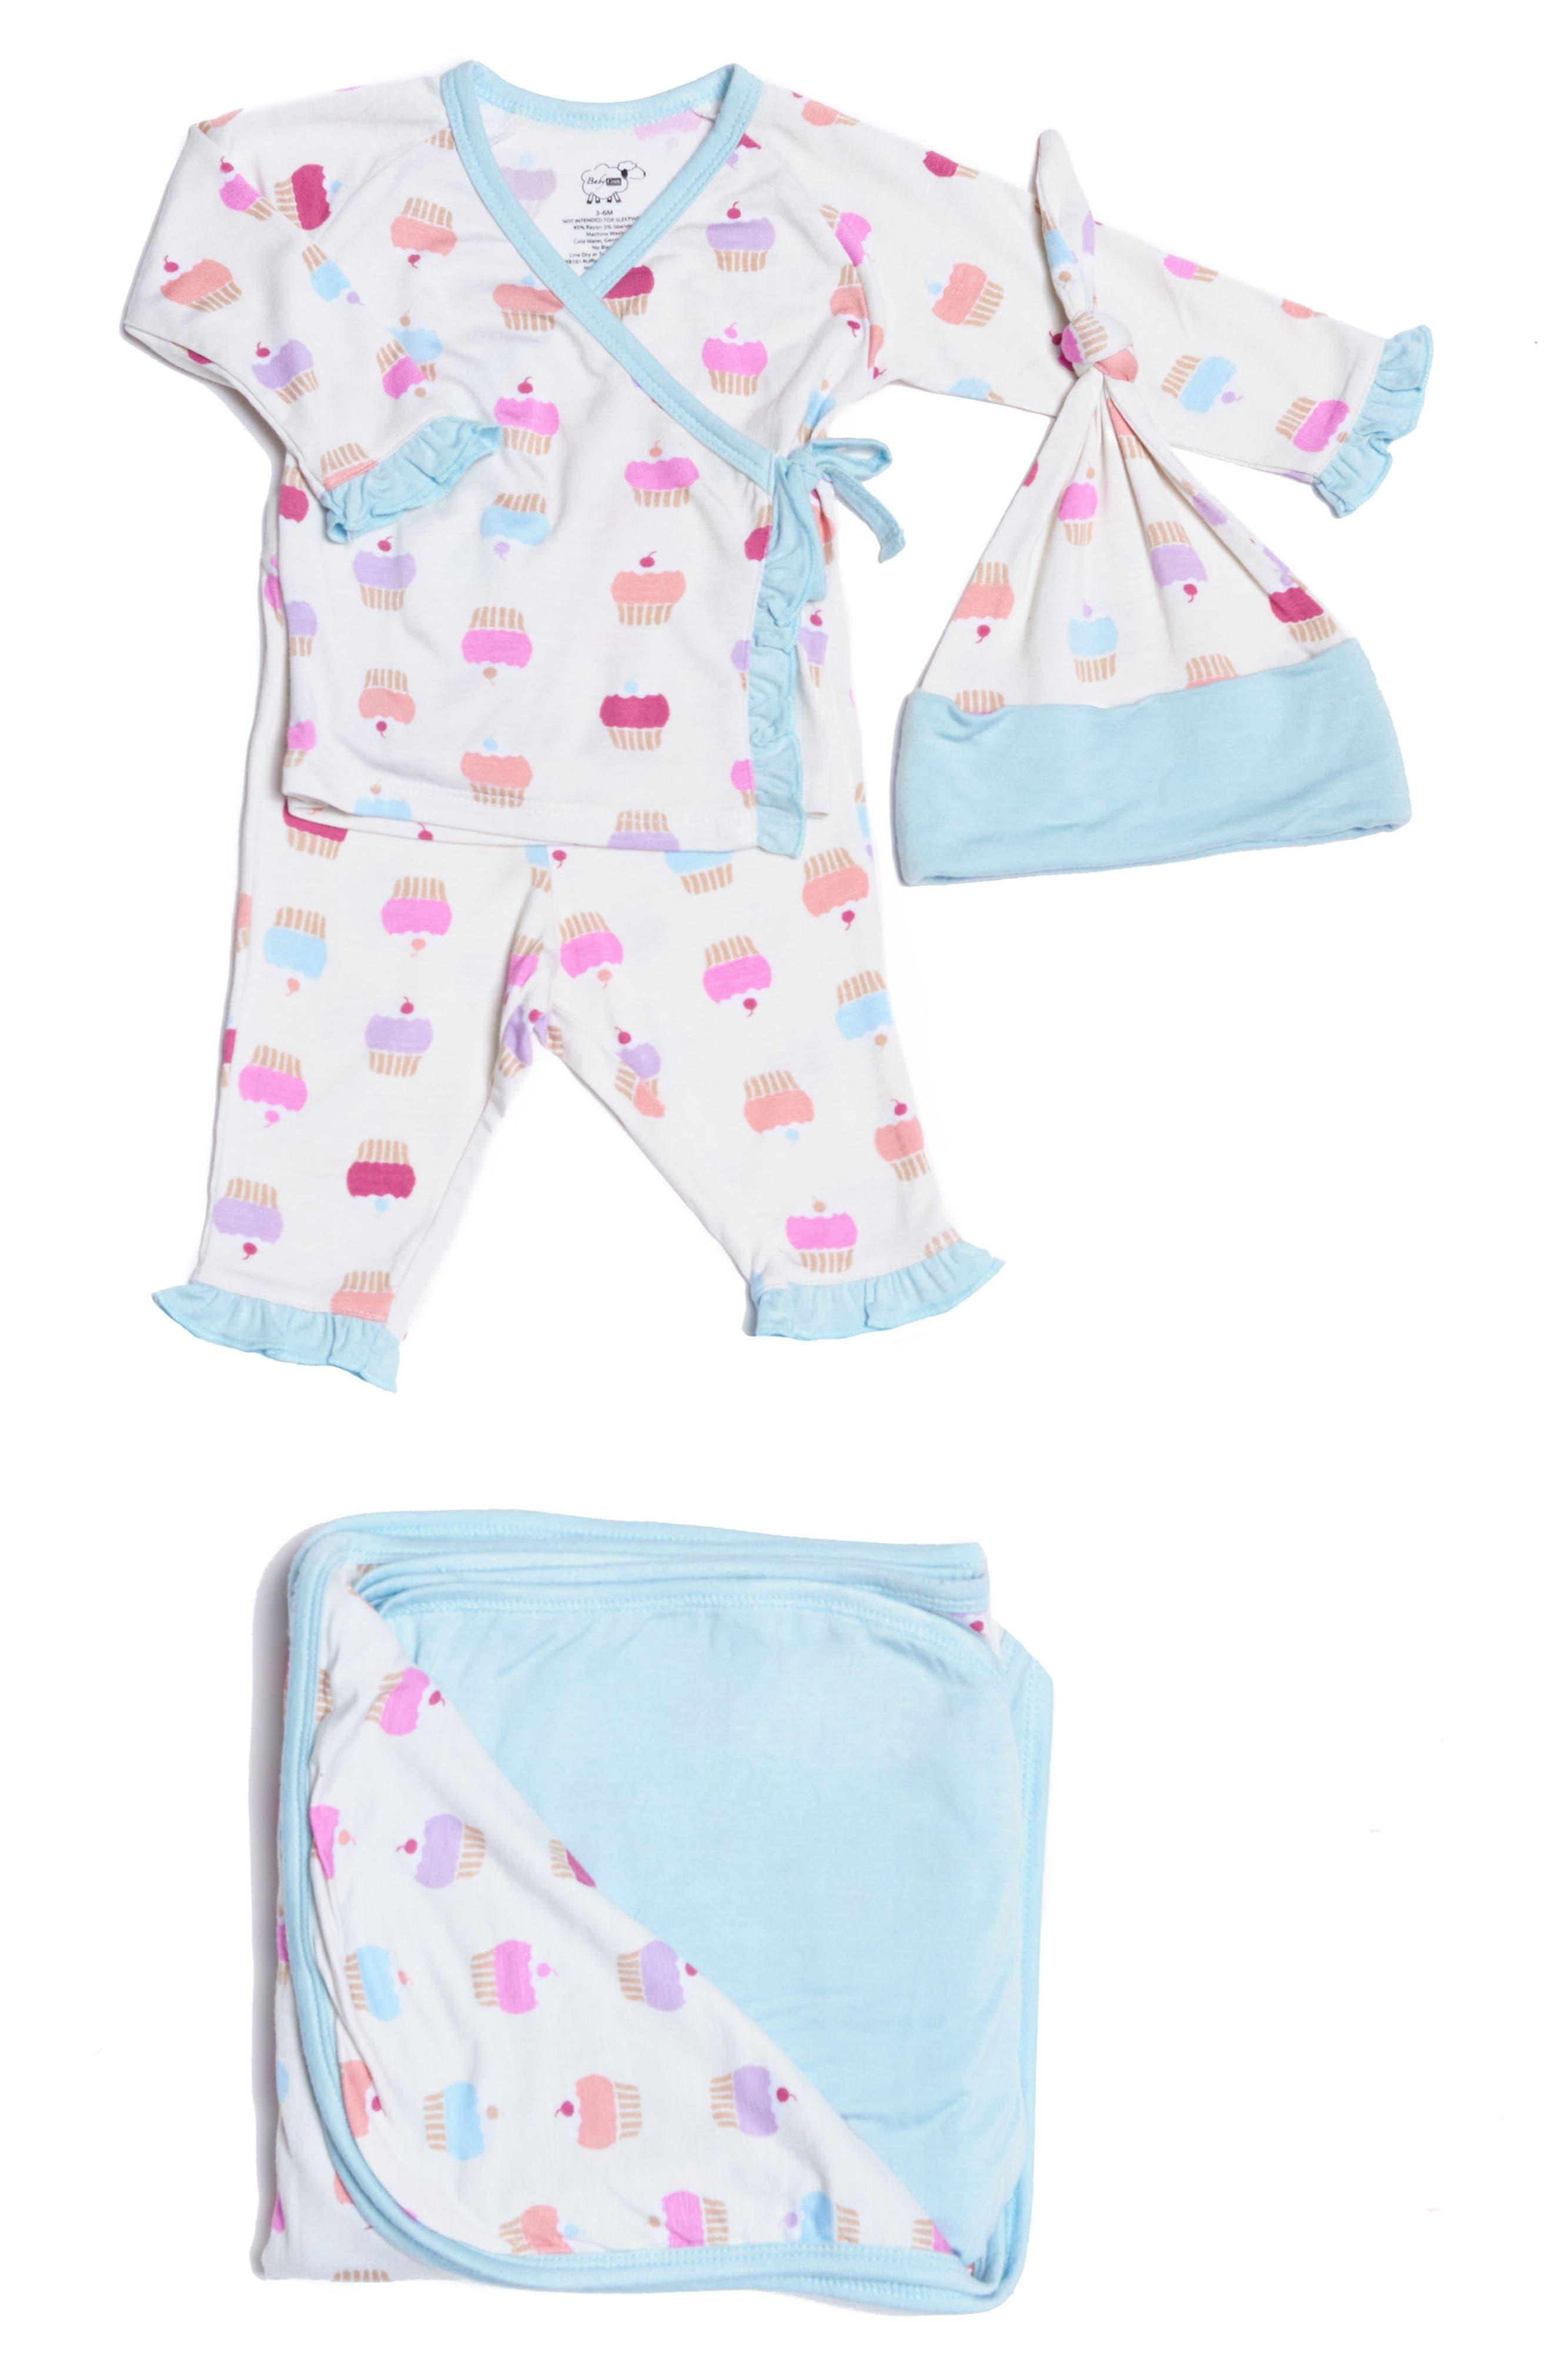 Ruffle Kimono Top, Pants, Hat & Blanket Set,                             Main thumbnail 1, color,                             Cupcakes